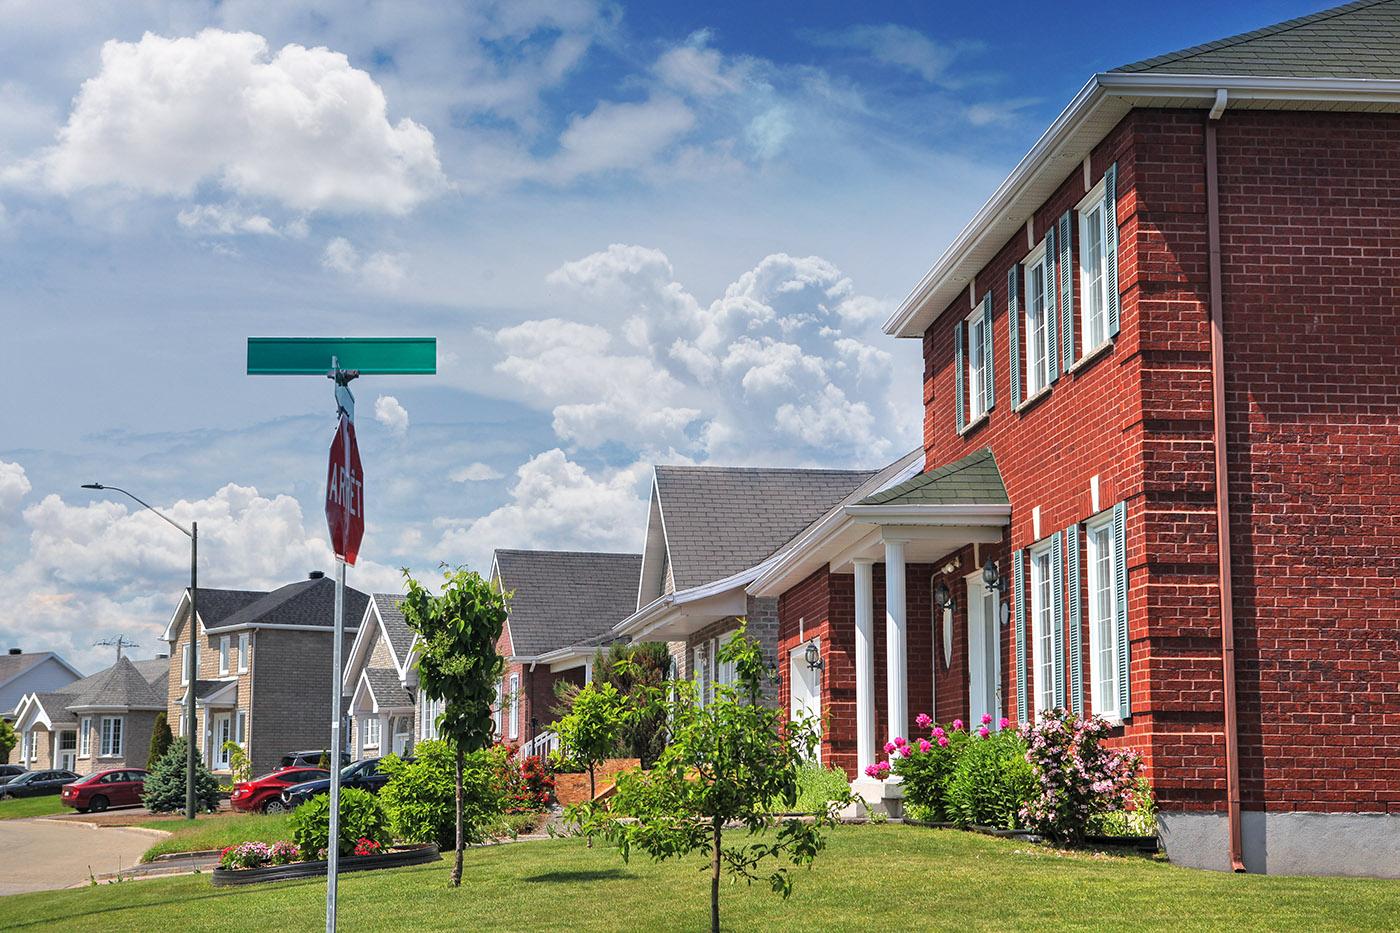 Quiet Neighborhood - RF Stock Image